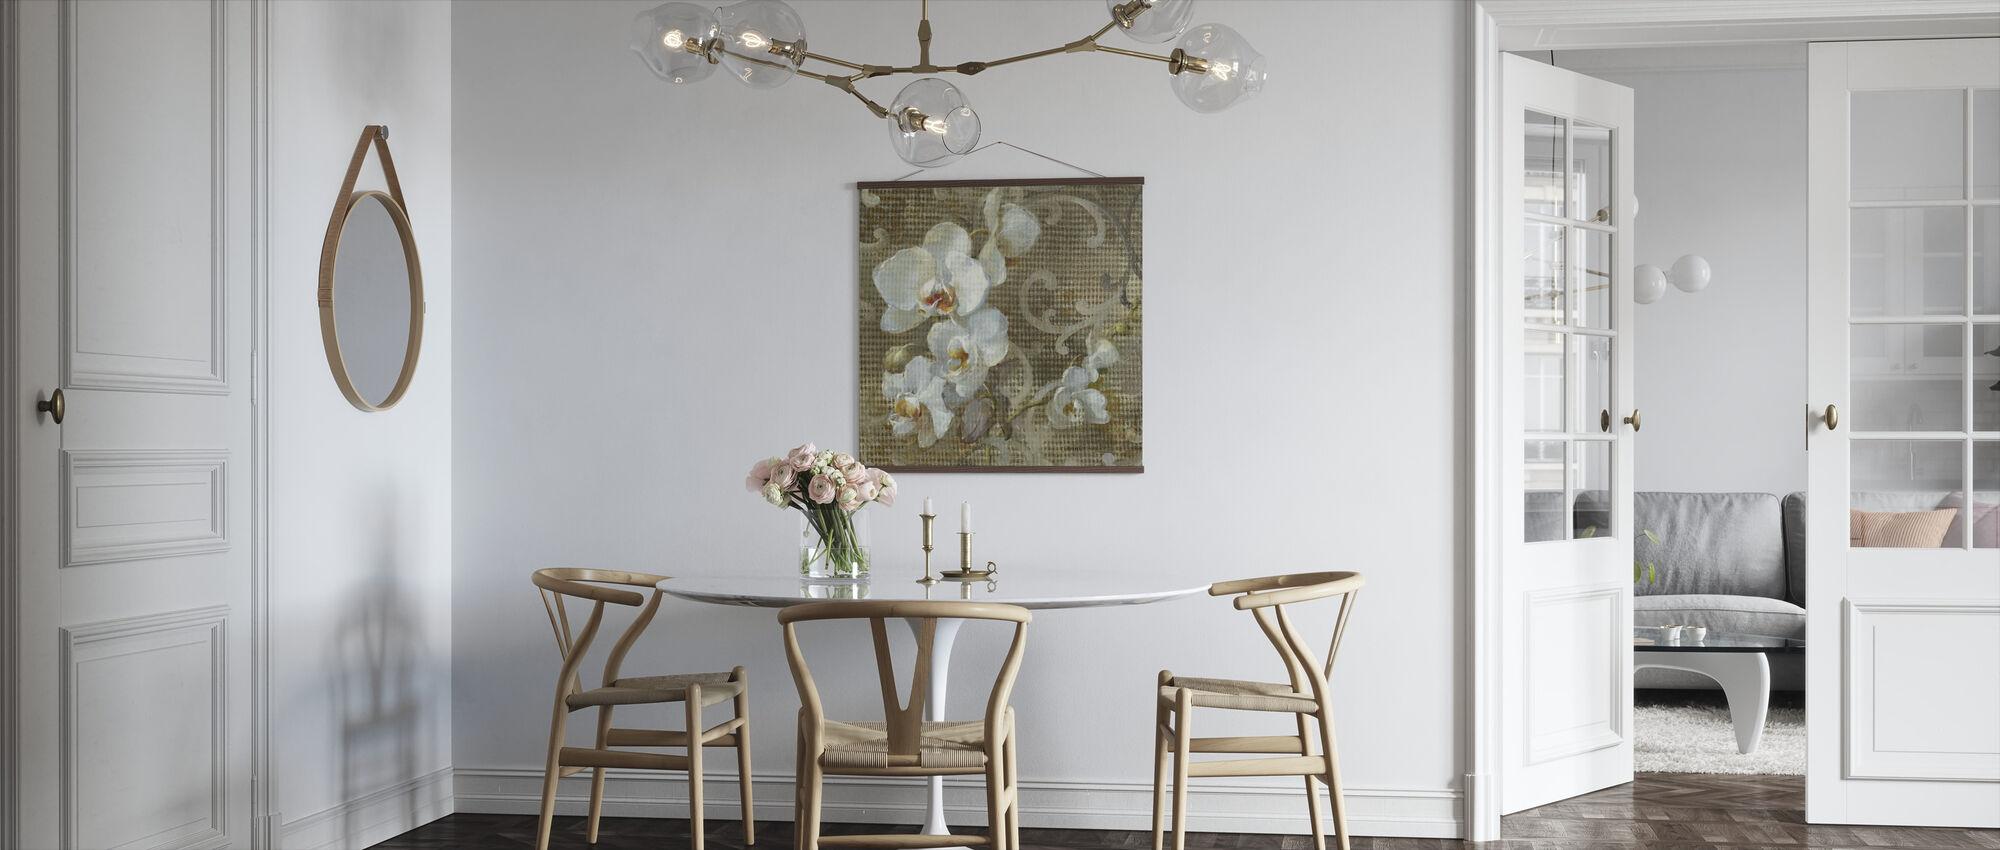 Witte Orchidee Vierkant - Poster - Keuken